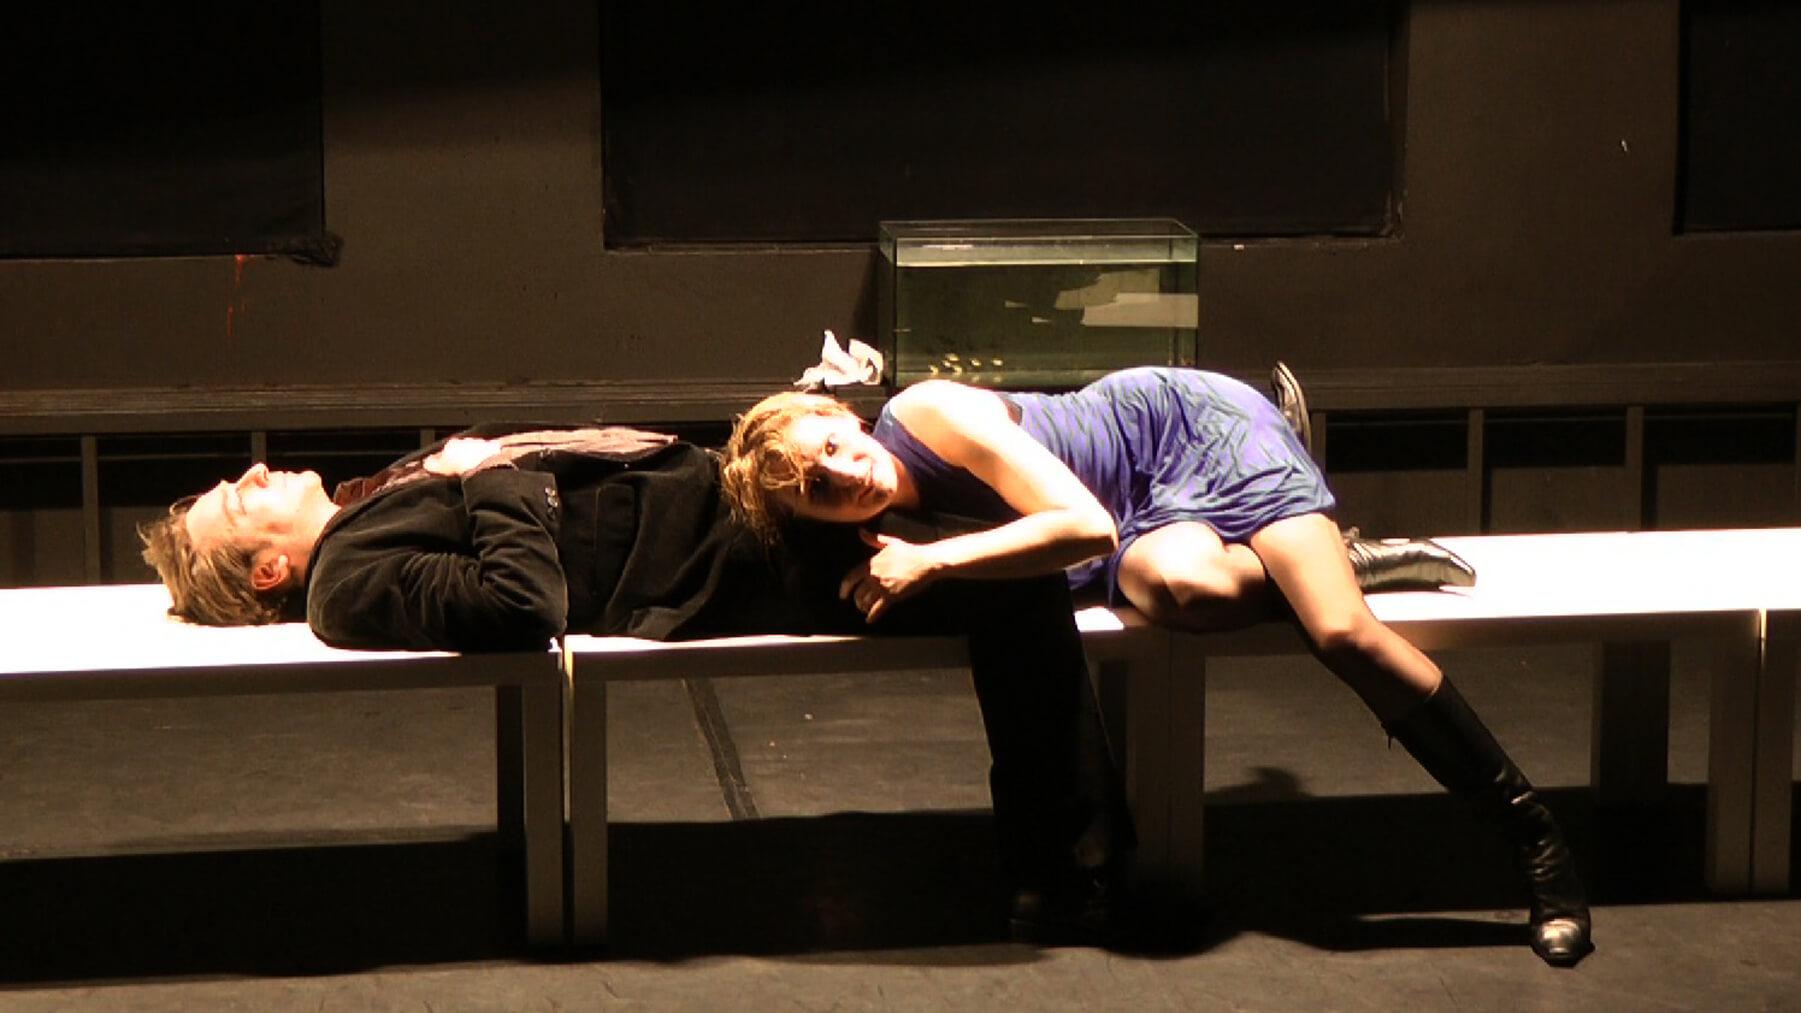 La Musica Zwei Marguerite Duras Theater Berlin